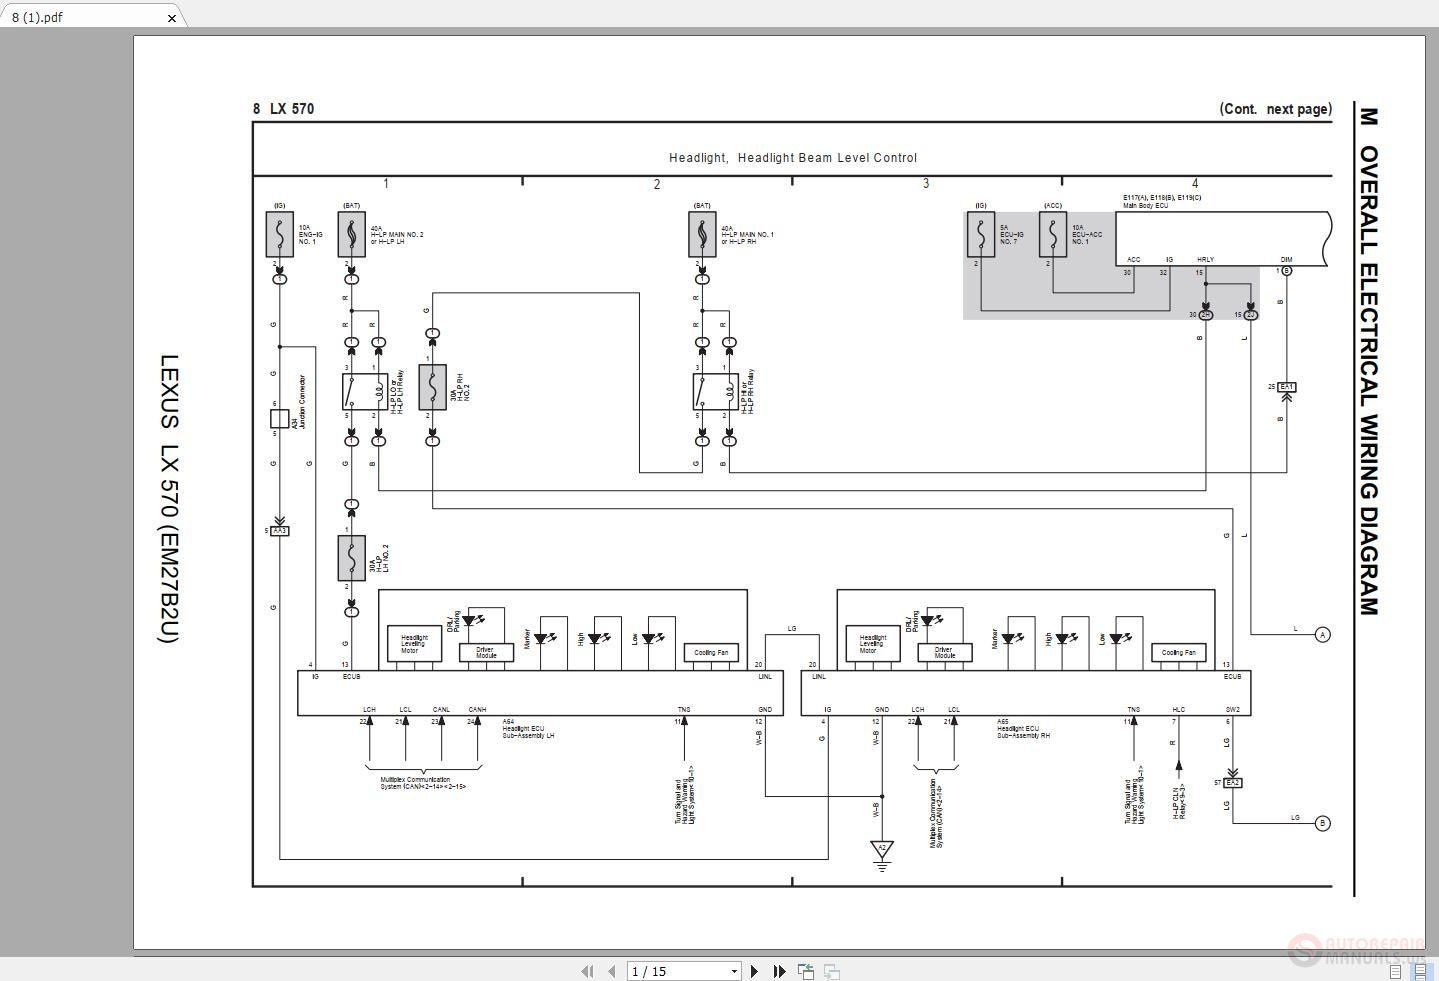 Lexus Ac Wiring Diagrams - Bladez Engine Diagram -  fuseboxxxx.tehsusu.decorresine.itWiring Diagram Resource